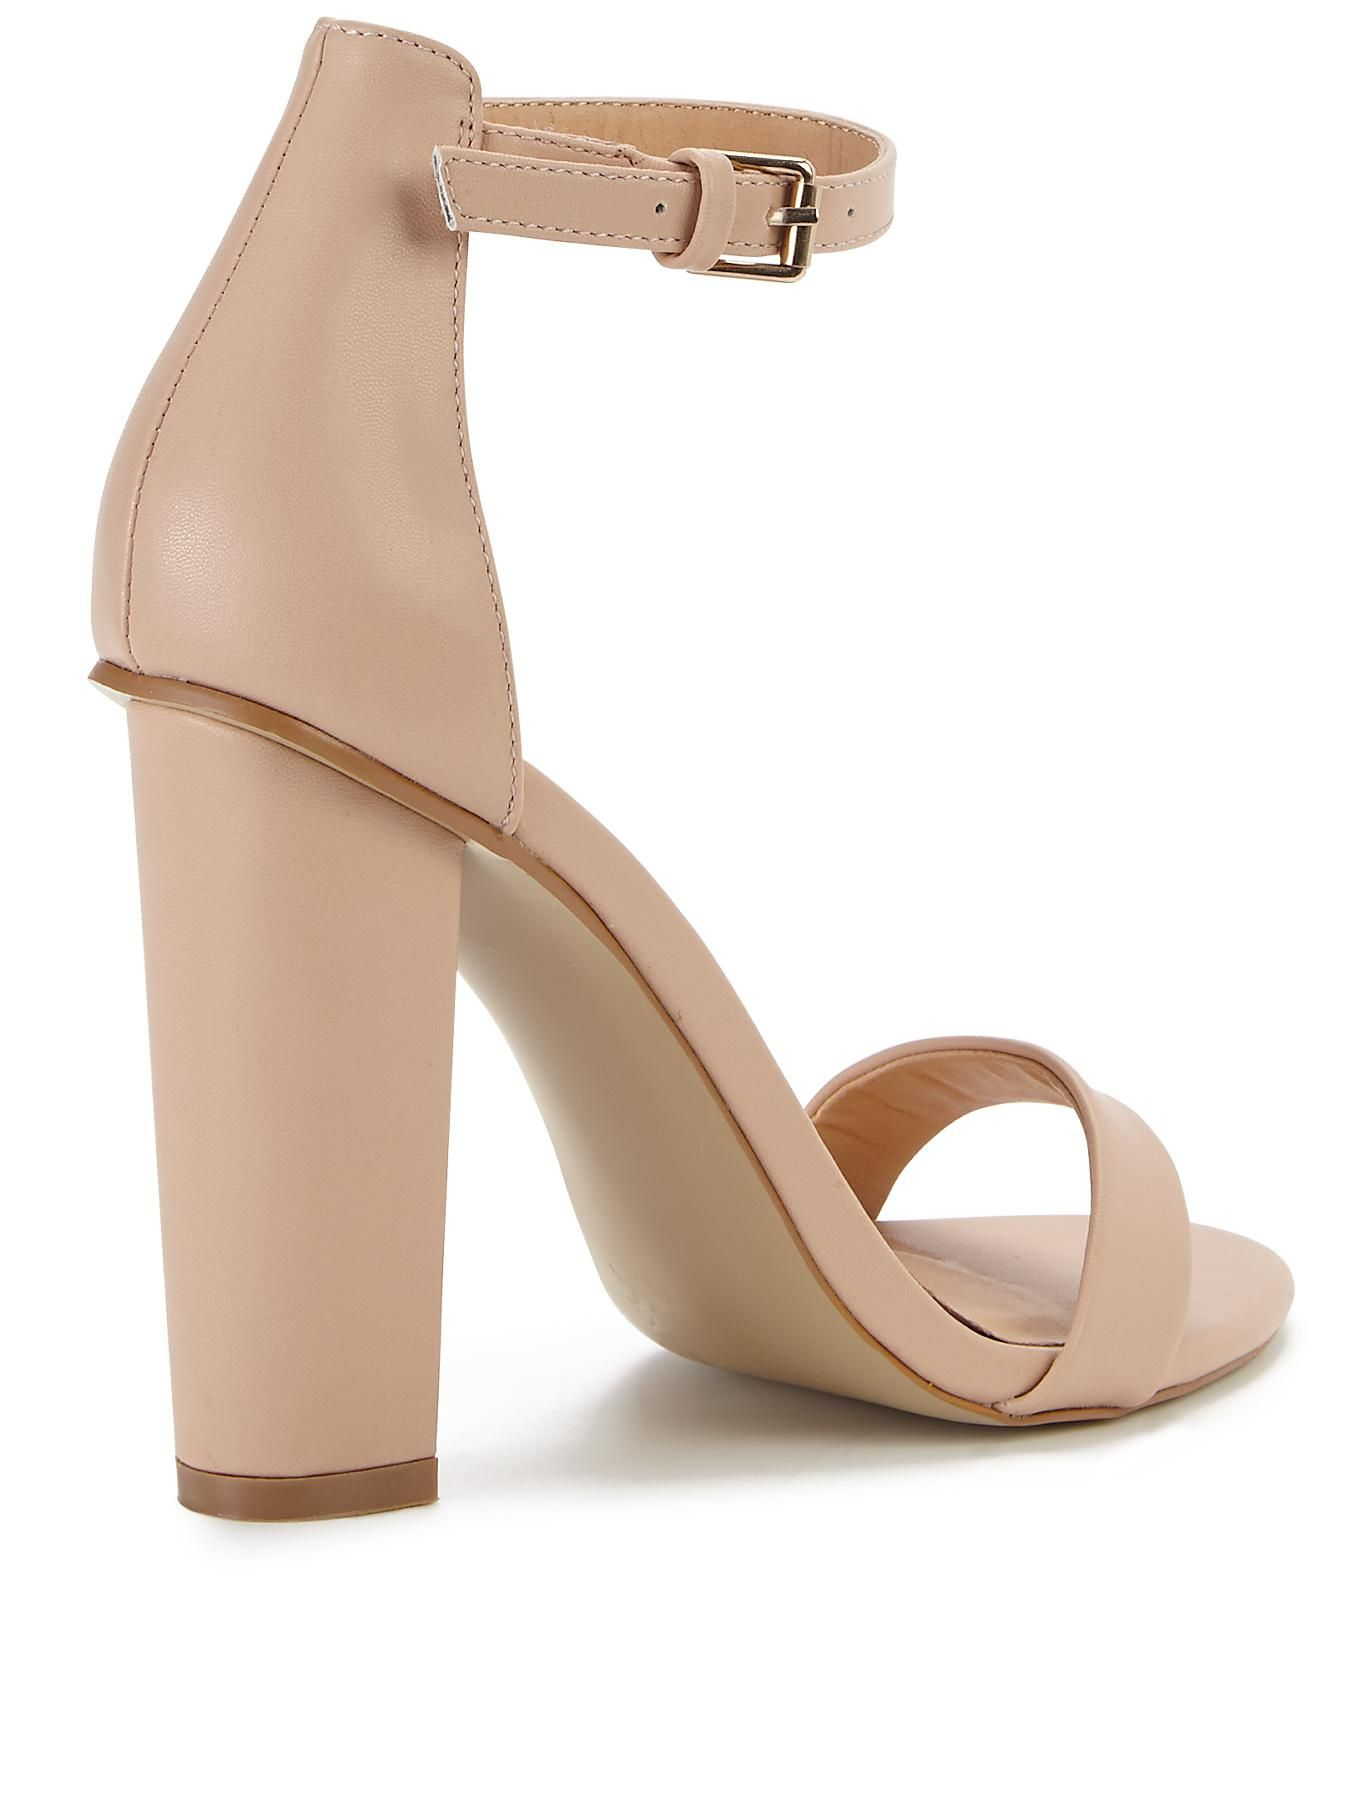 d5e24372de8 Shoe Box Daisy High Block Heeled Ankle Strap Sandals - Nude